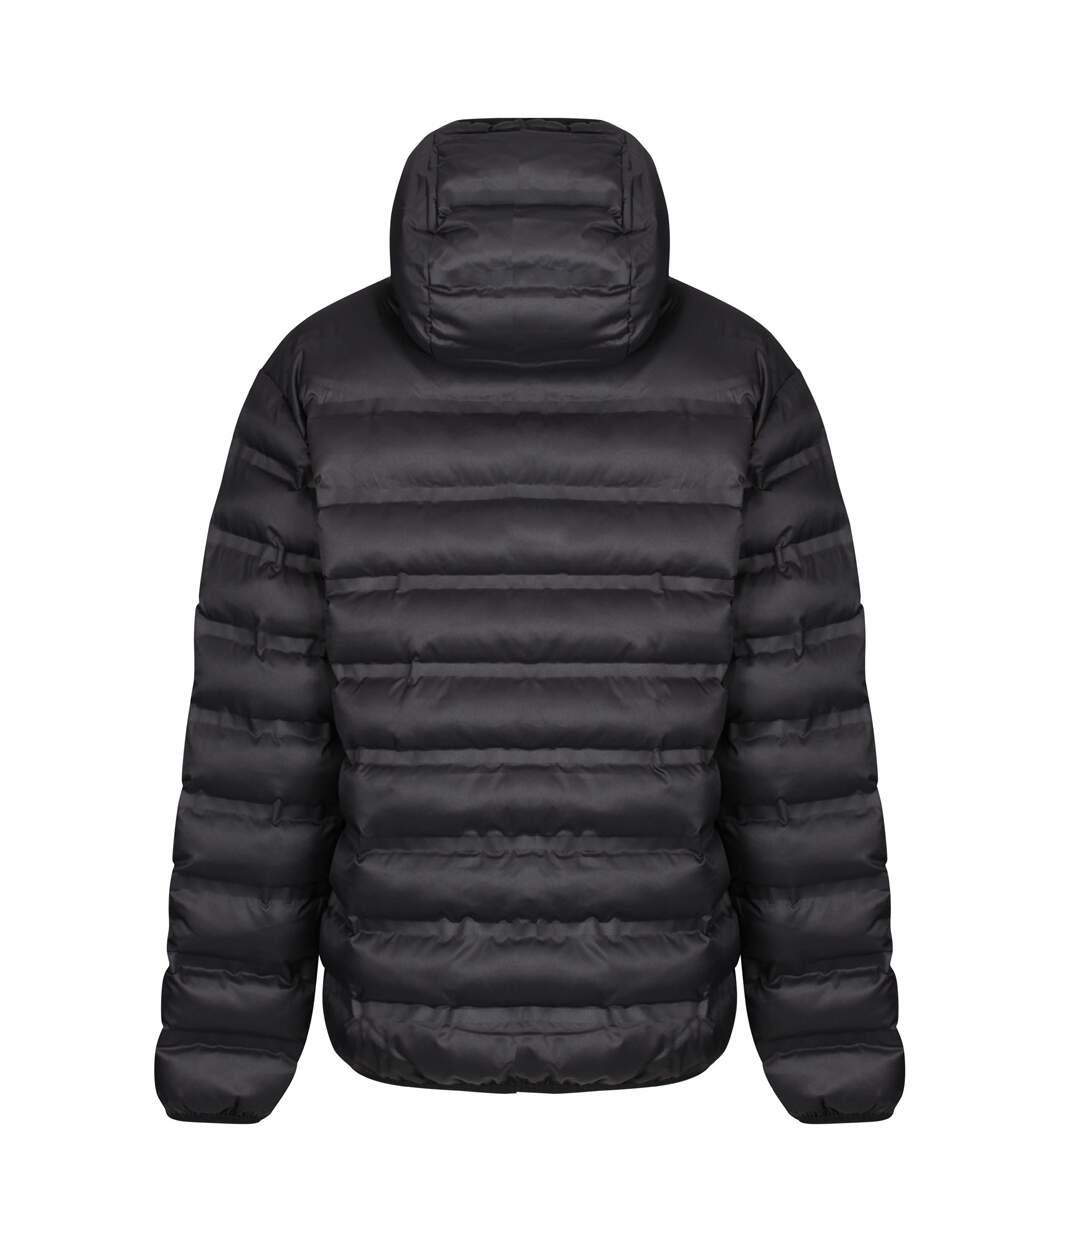 Regatta Mens XPro Icefall III Insulated Jacket (Black) - UTPC4244